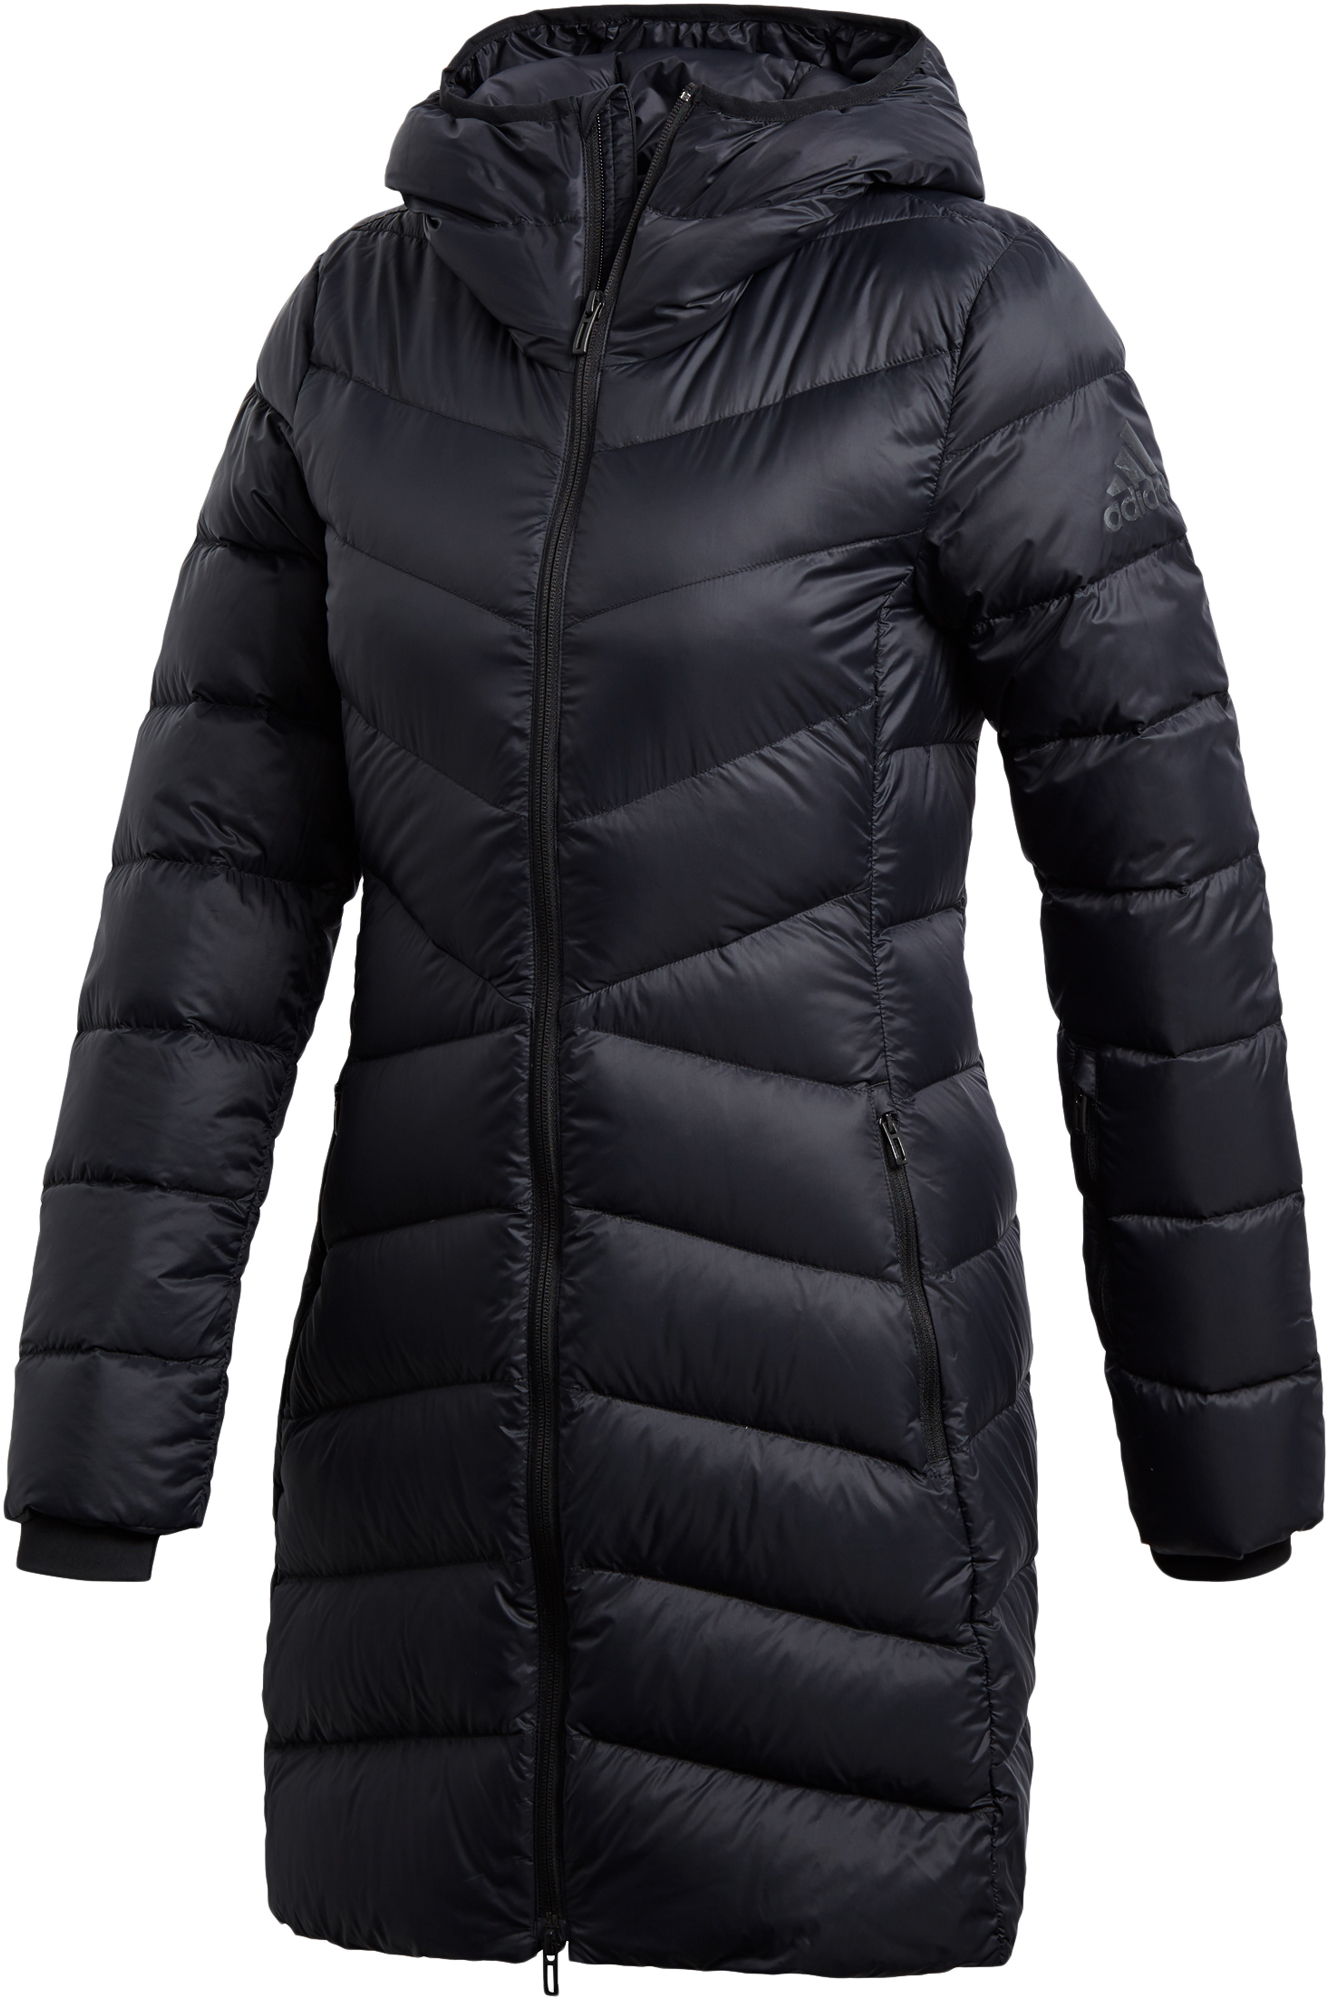 Adidas Куртка пуховая женская Nuvic, размер 52-54